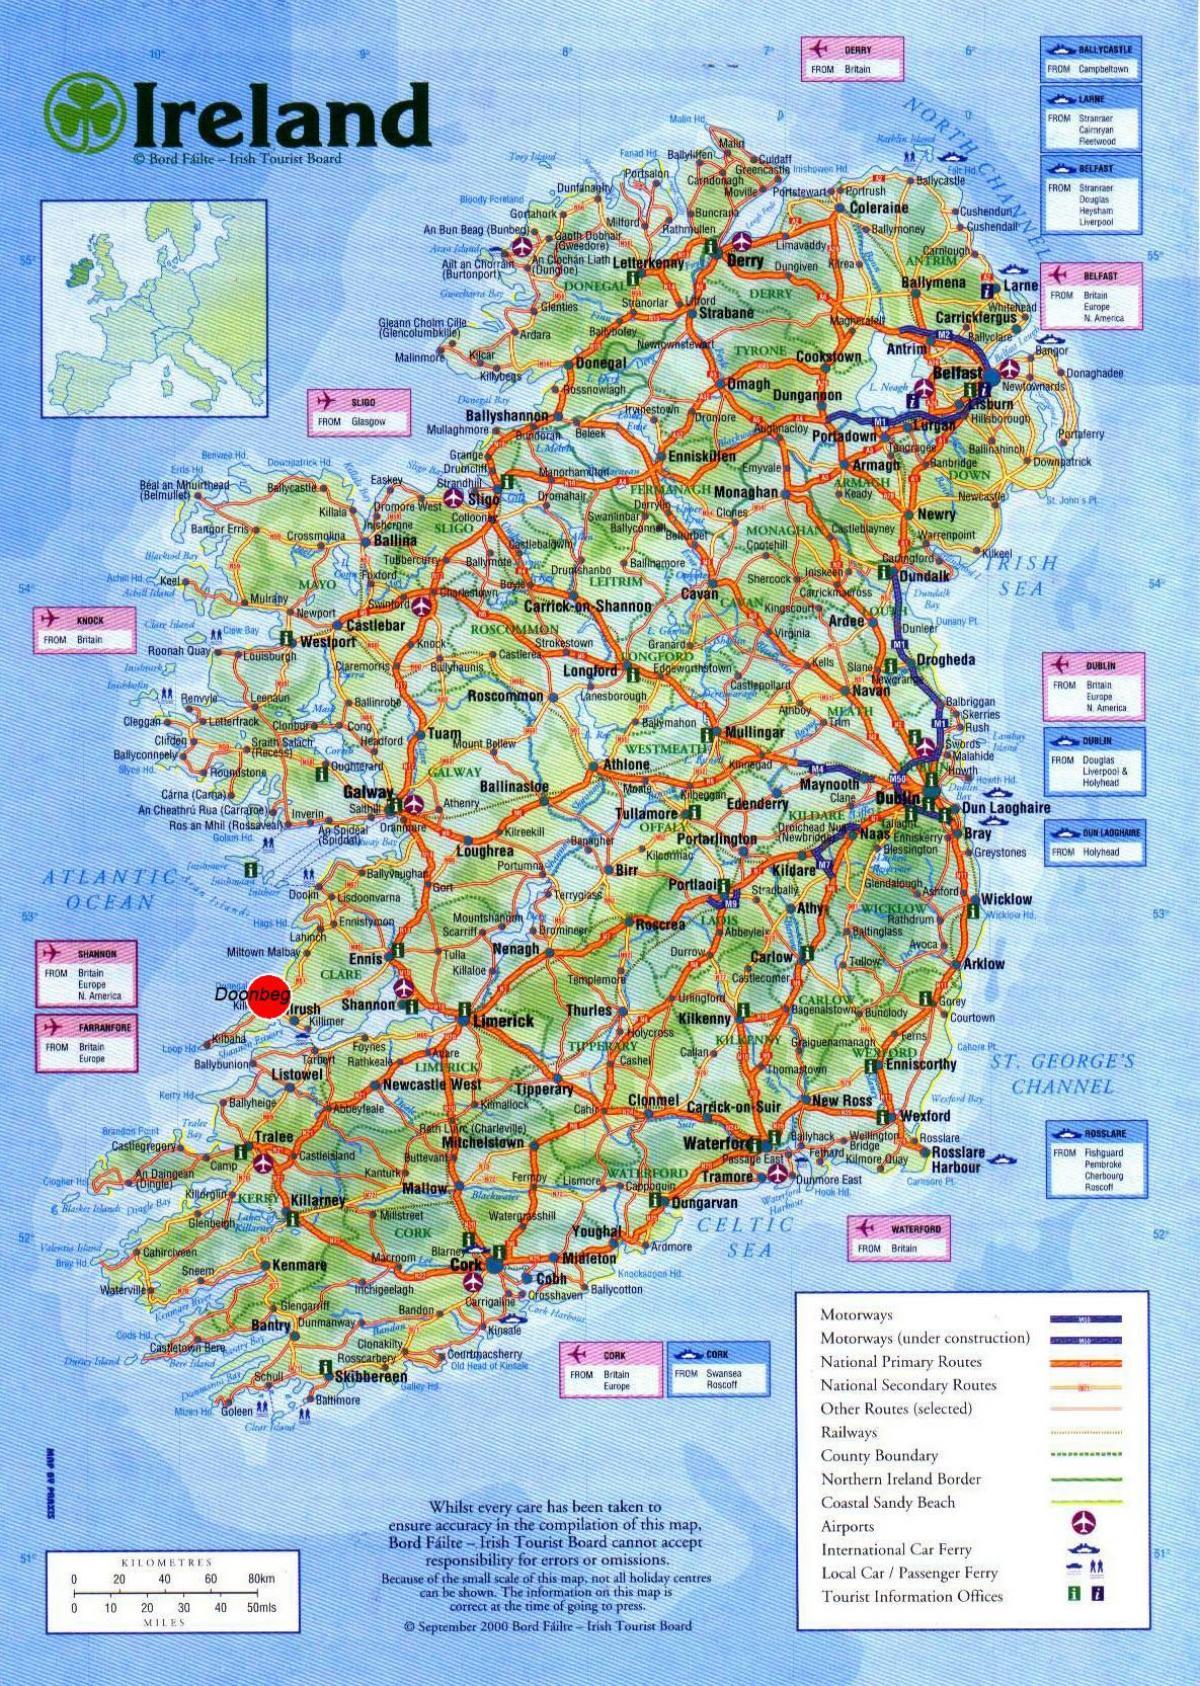 Irlanda Cartina Turistica.Irlanda Attrazioni Turistiche Mappa Mappa Di Irlanda Mostrando Attrazioni Turistiche Europa Del Nord Europa